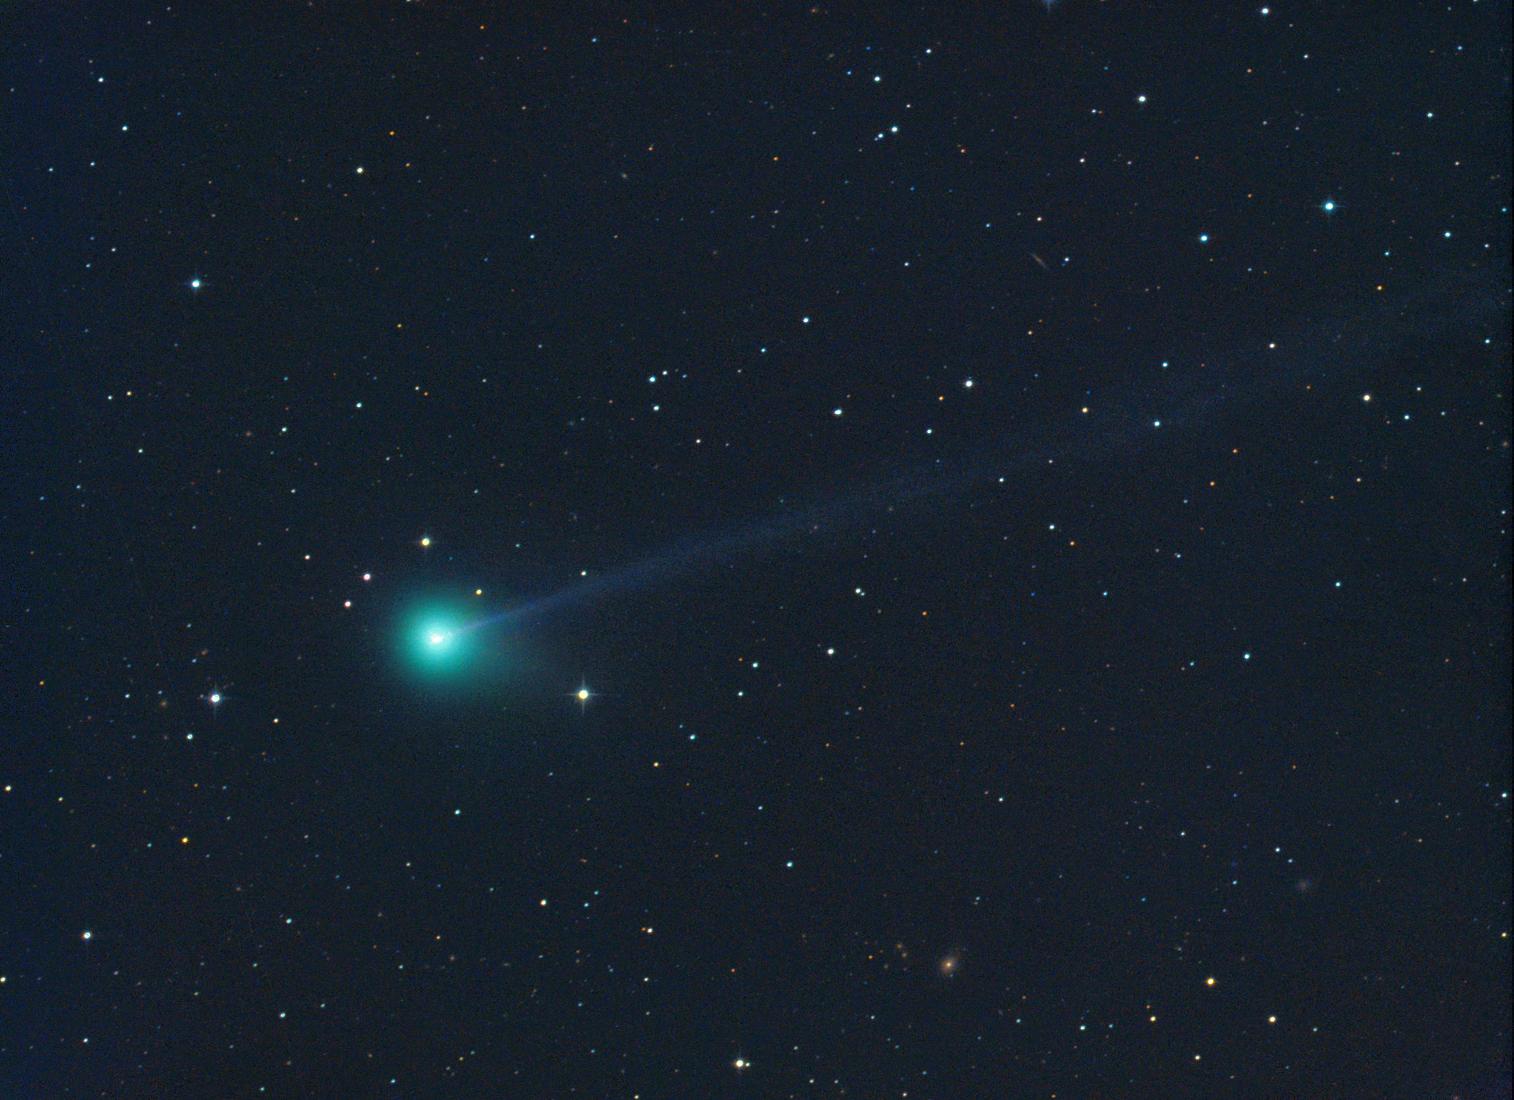 Astronomers area c amateur in d